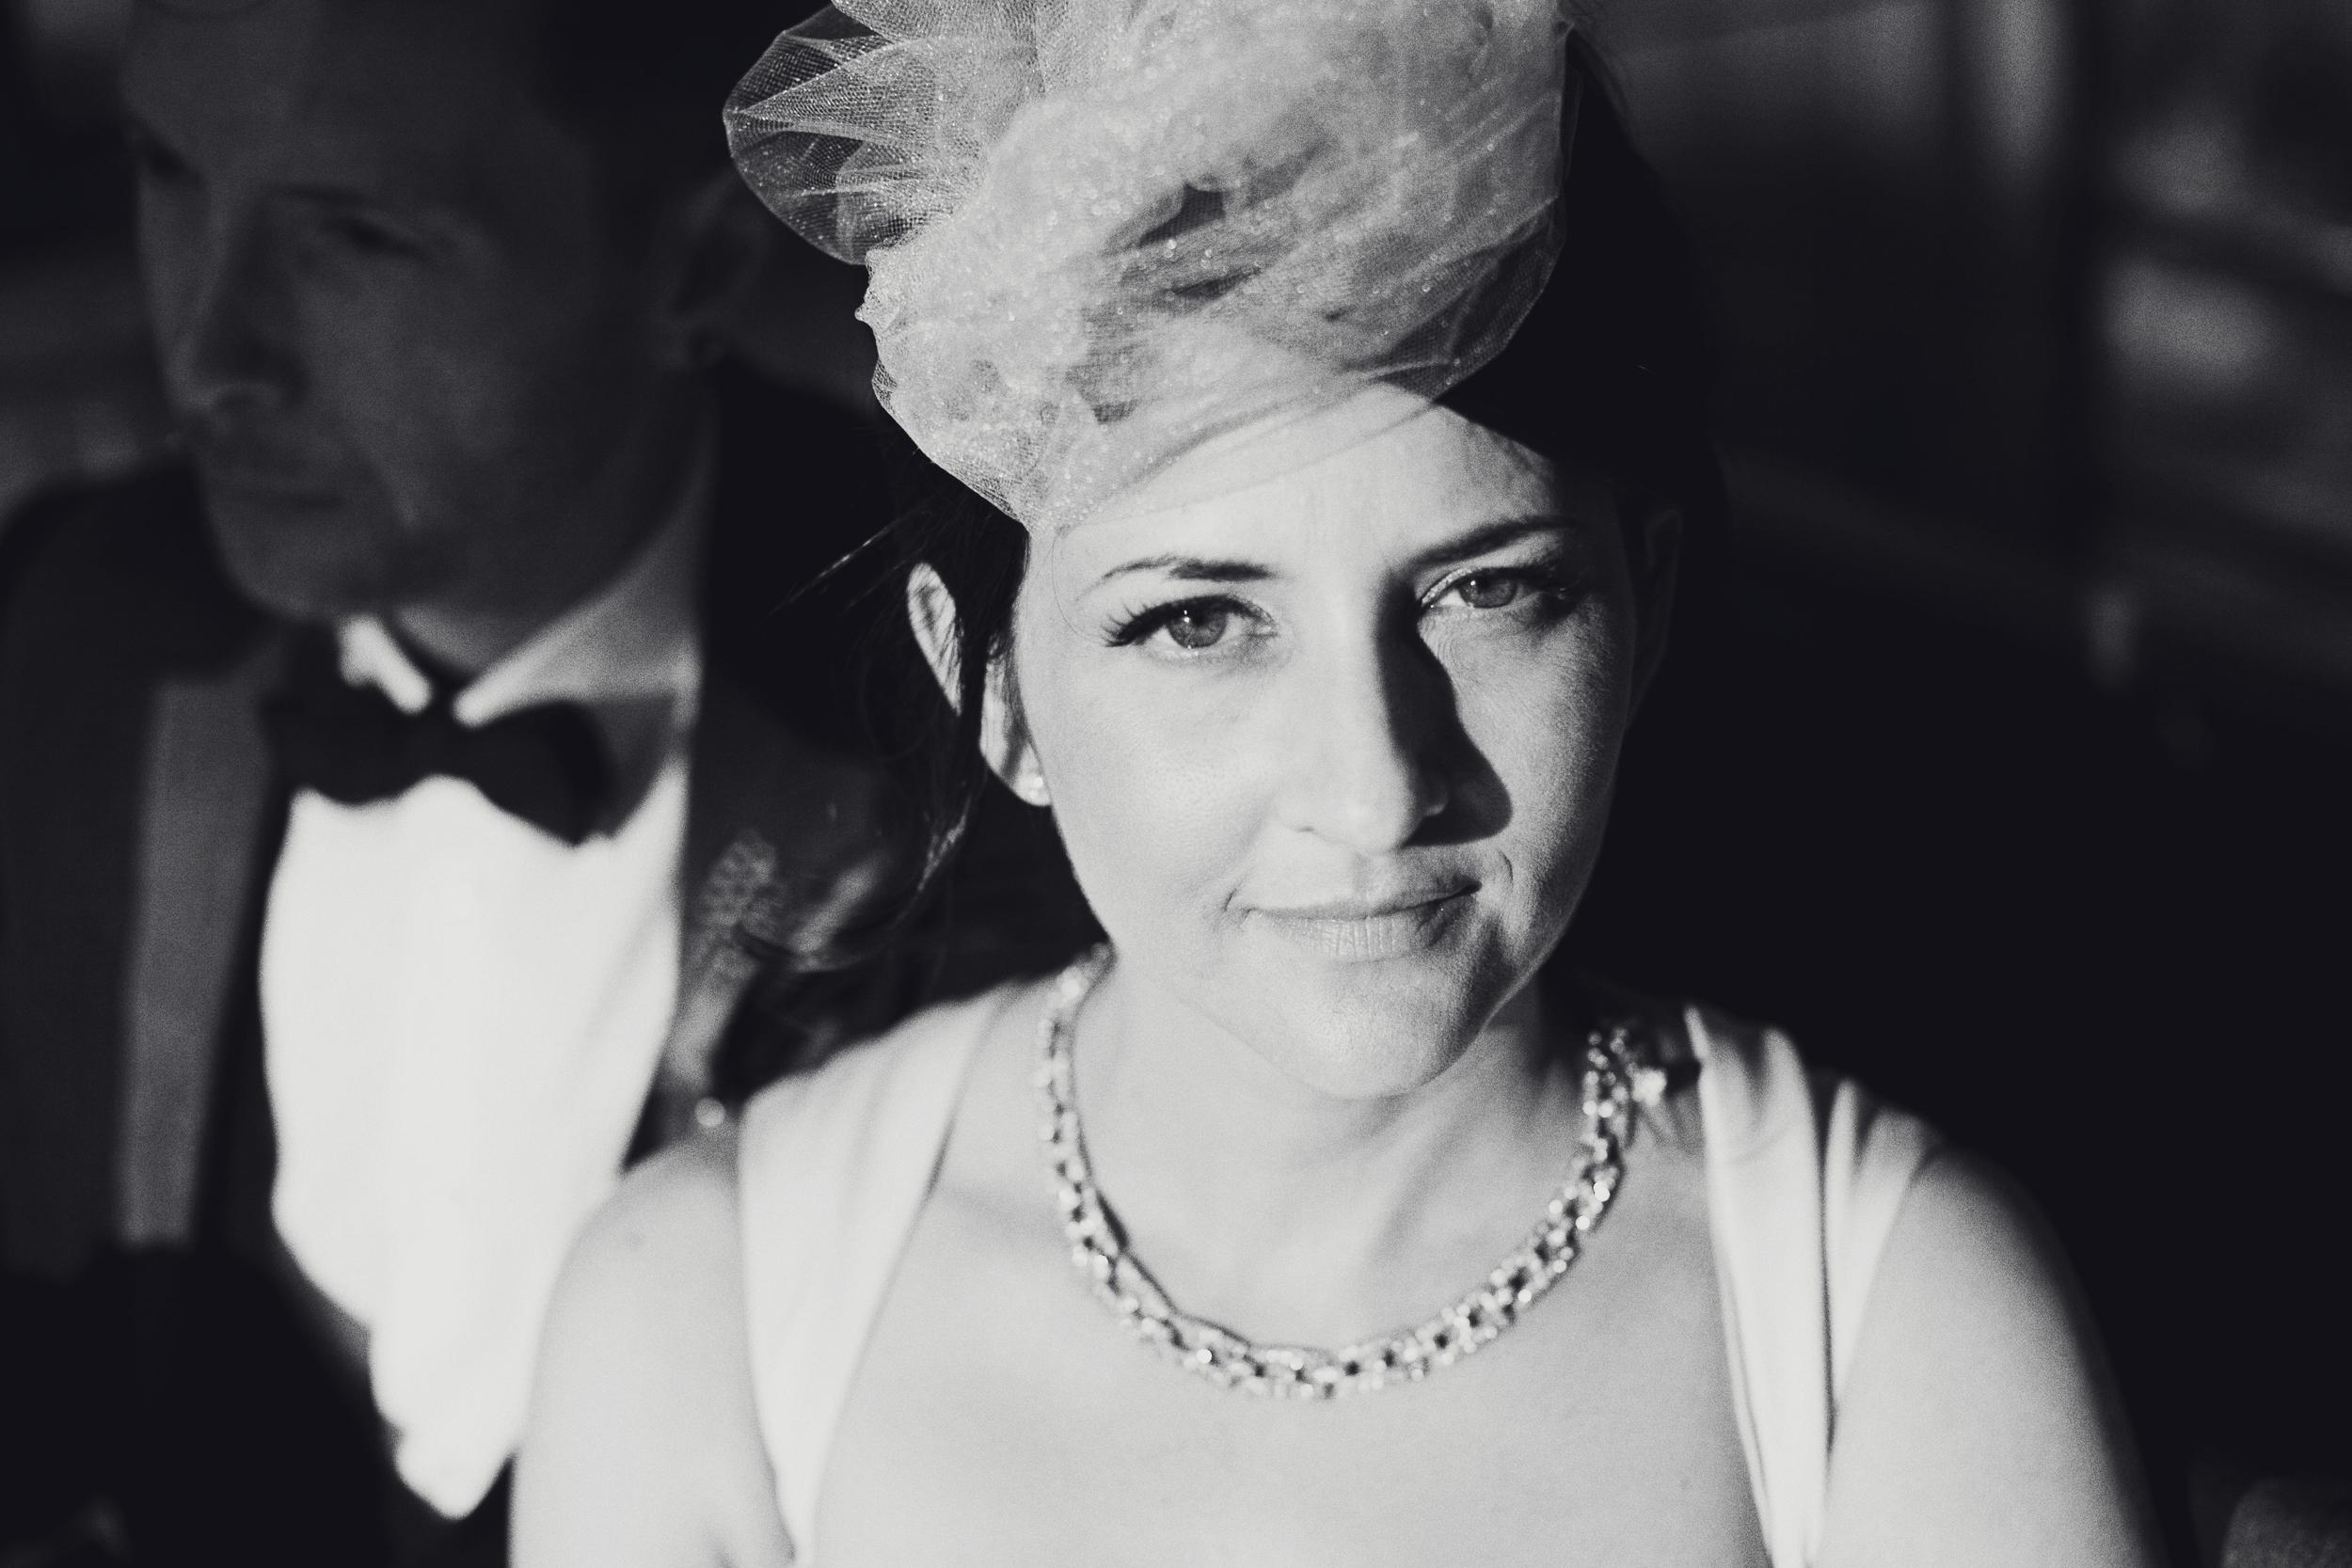 San_Francisco_City_Hall_Wedding_Photography_Cori_EB-20.JPG